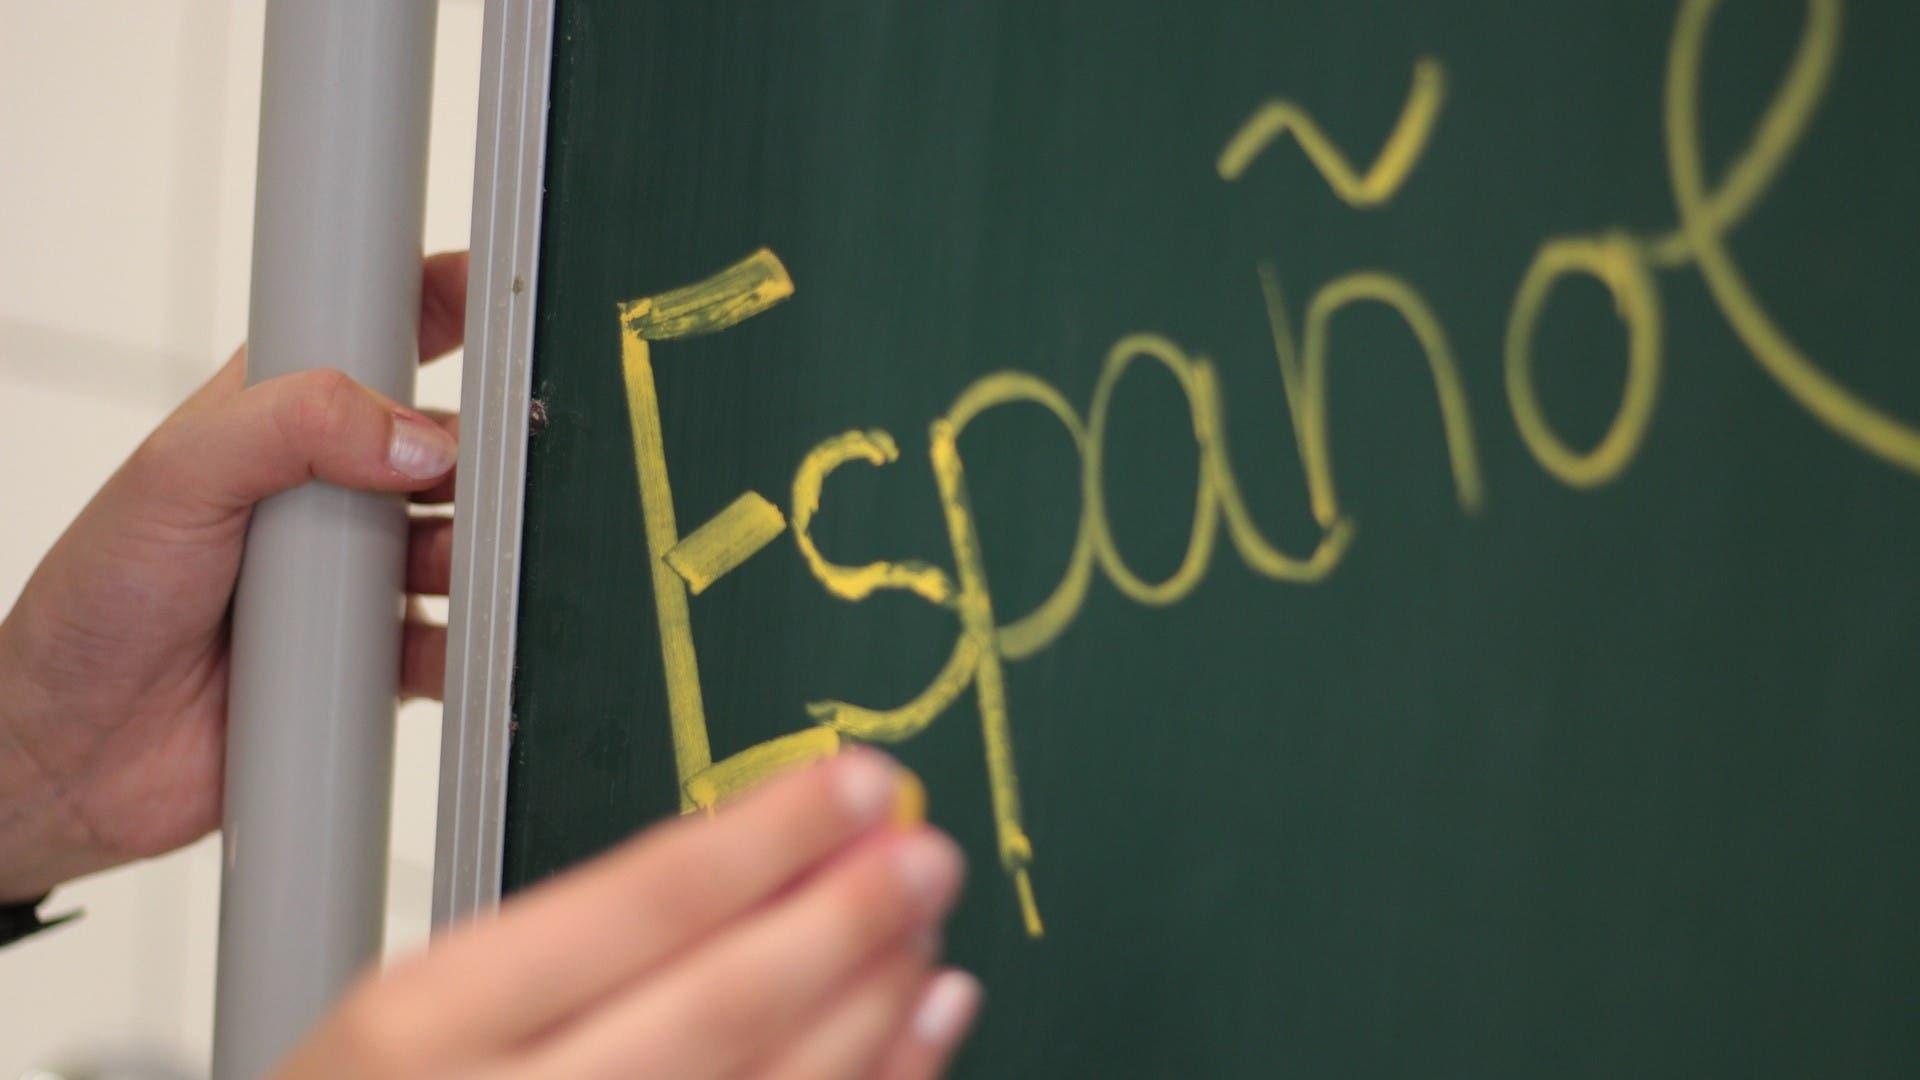 Estados Unidos busca maestros mexicanos para que den clases de español